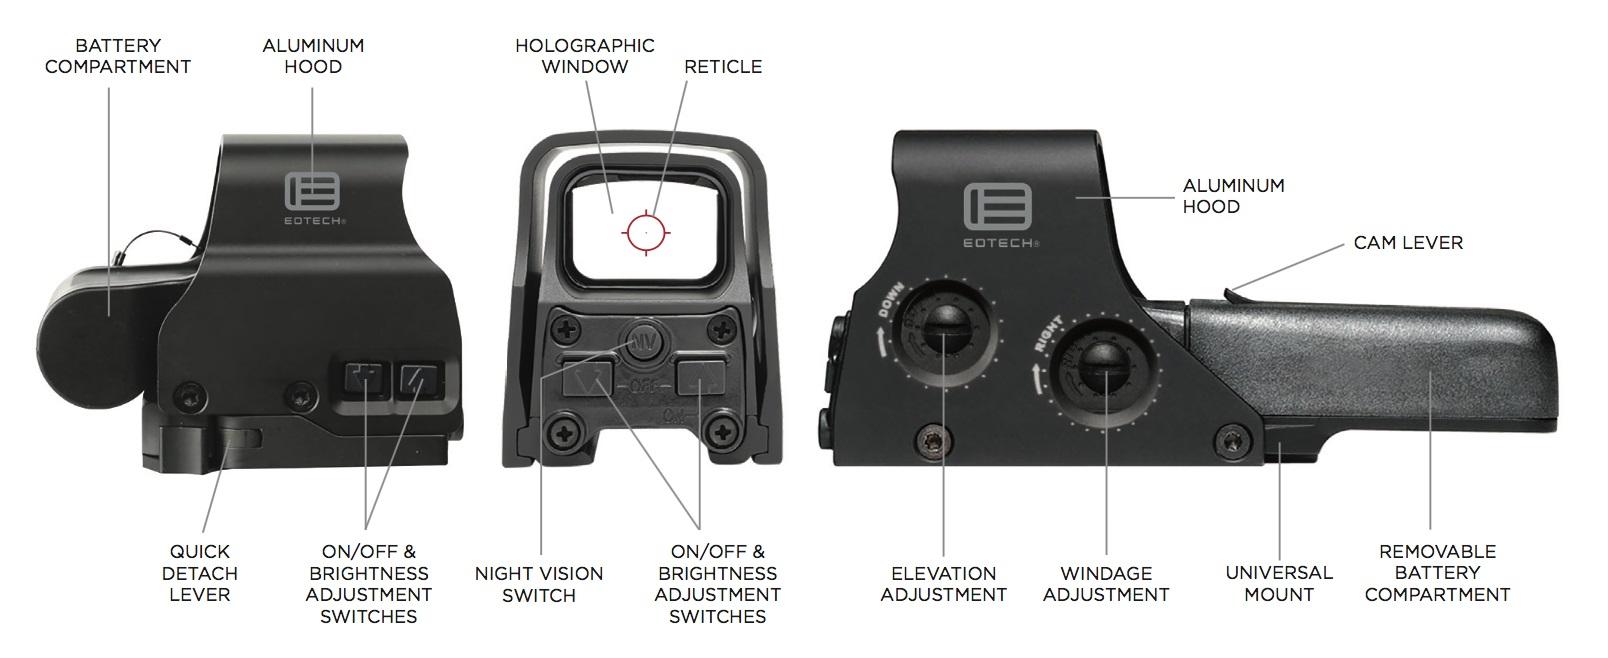 EOtech XPS3 Holografische Zielerfassung Bild 4